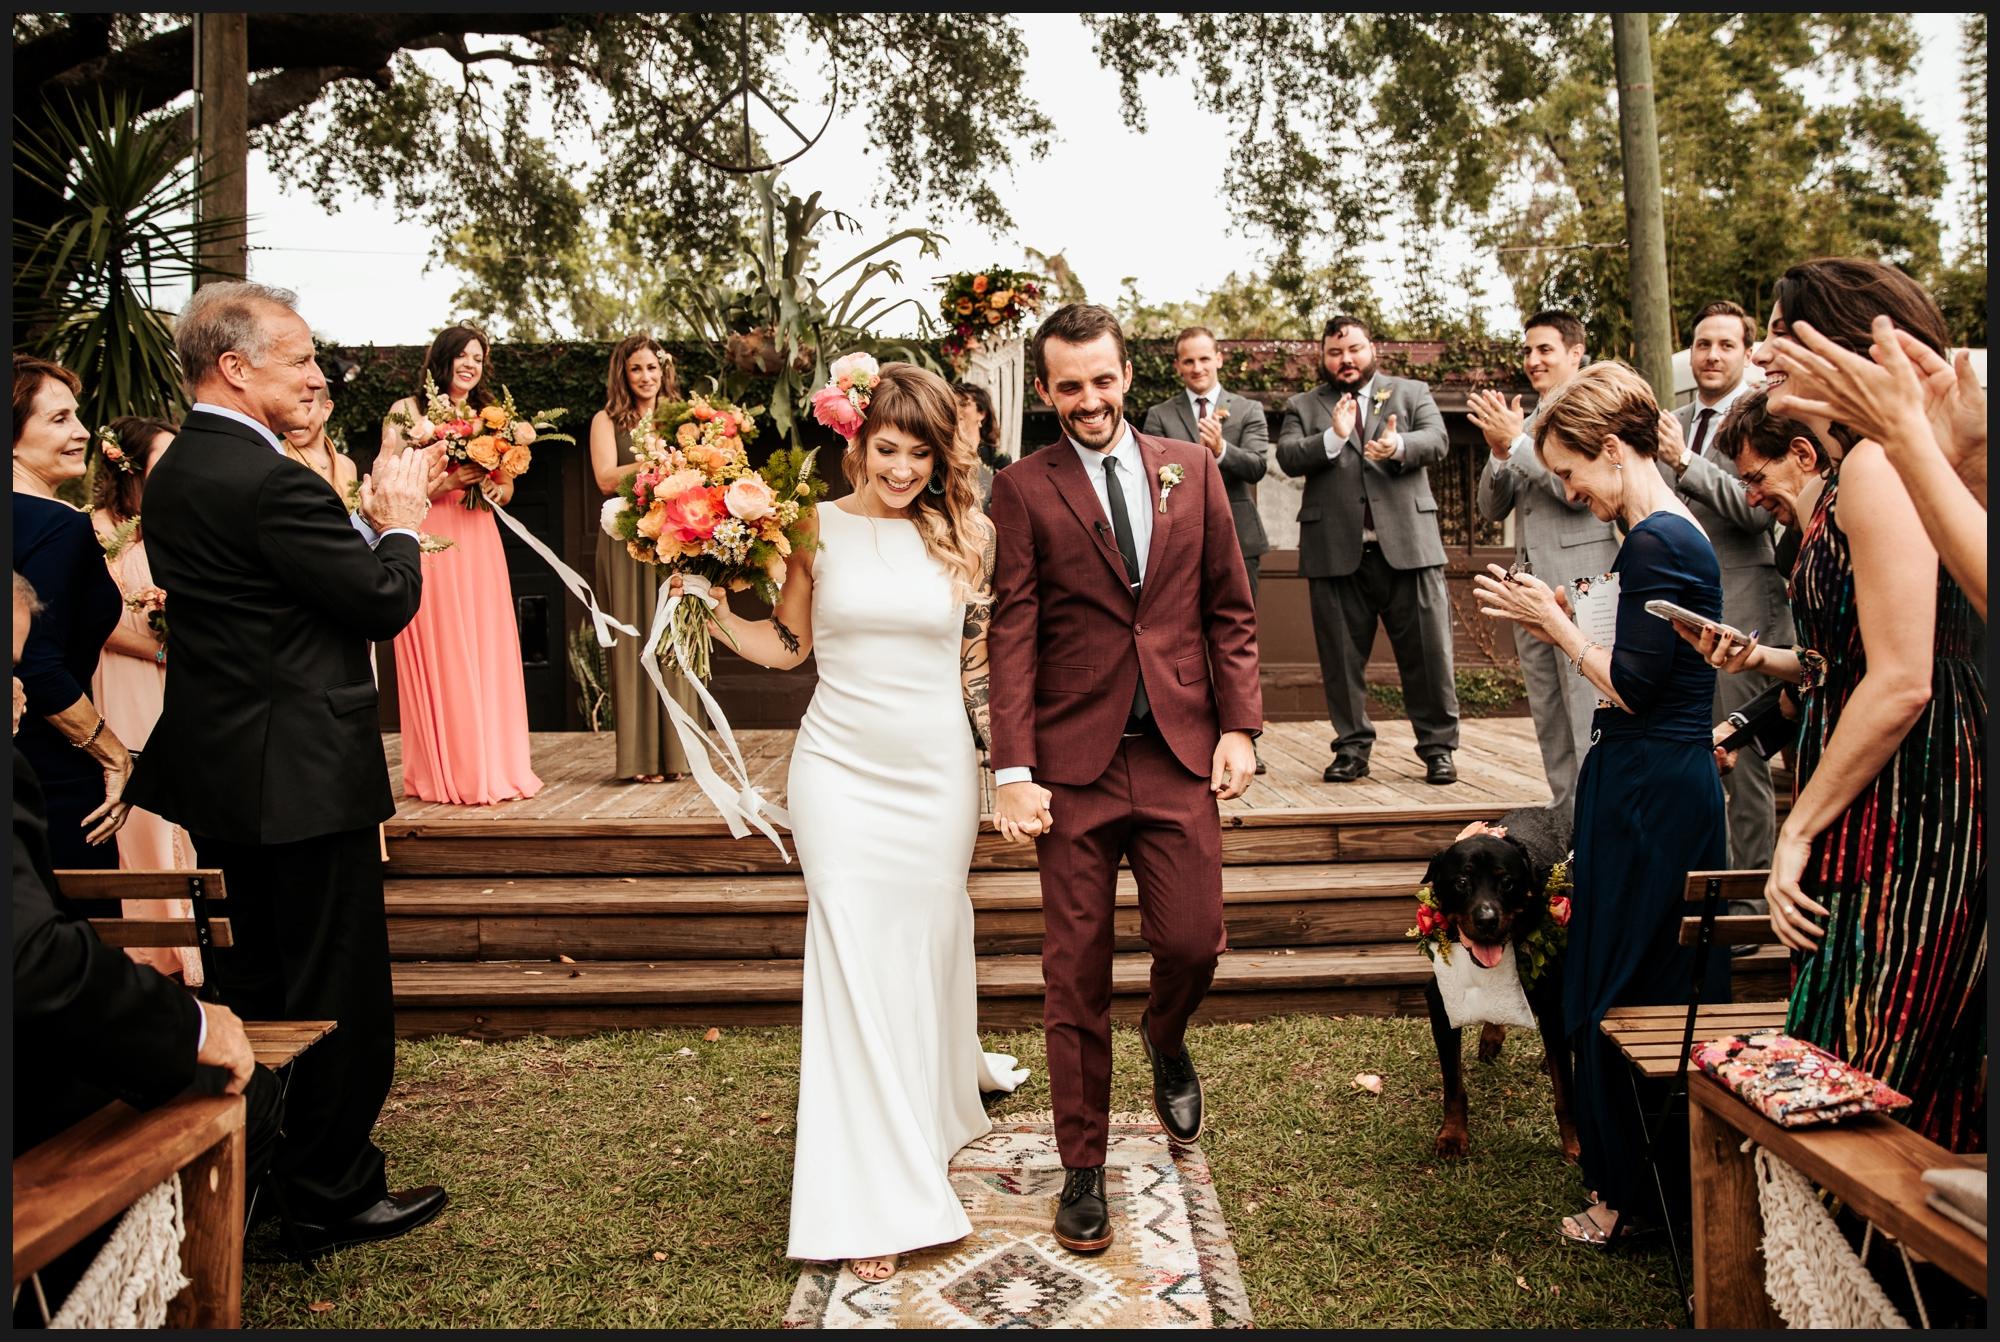 Orlando-Wedding-Photographer-destination-wedding-photographer-florida-wedding-photographer-bohemian-wedding-photographer_2012.jpg